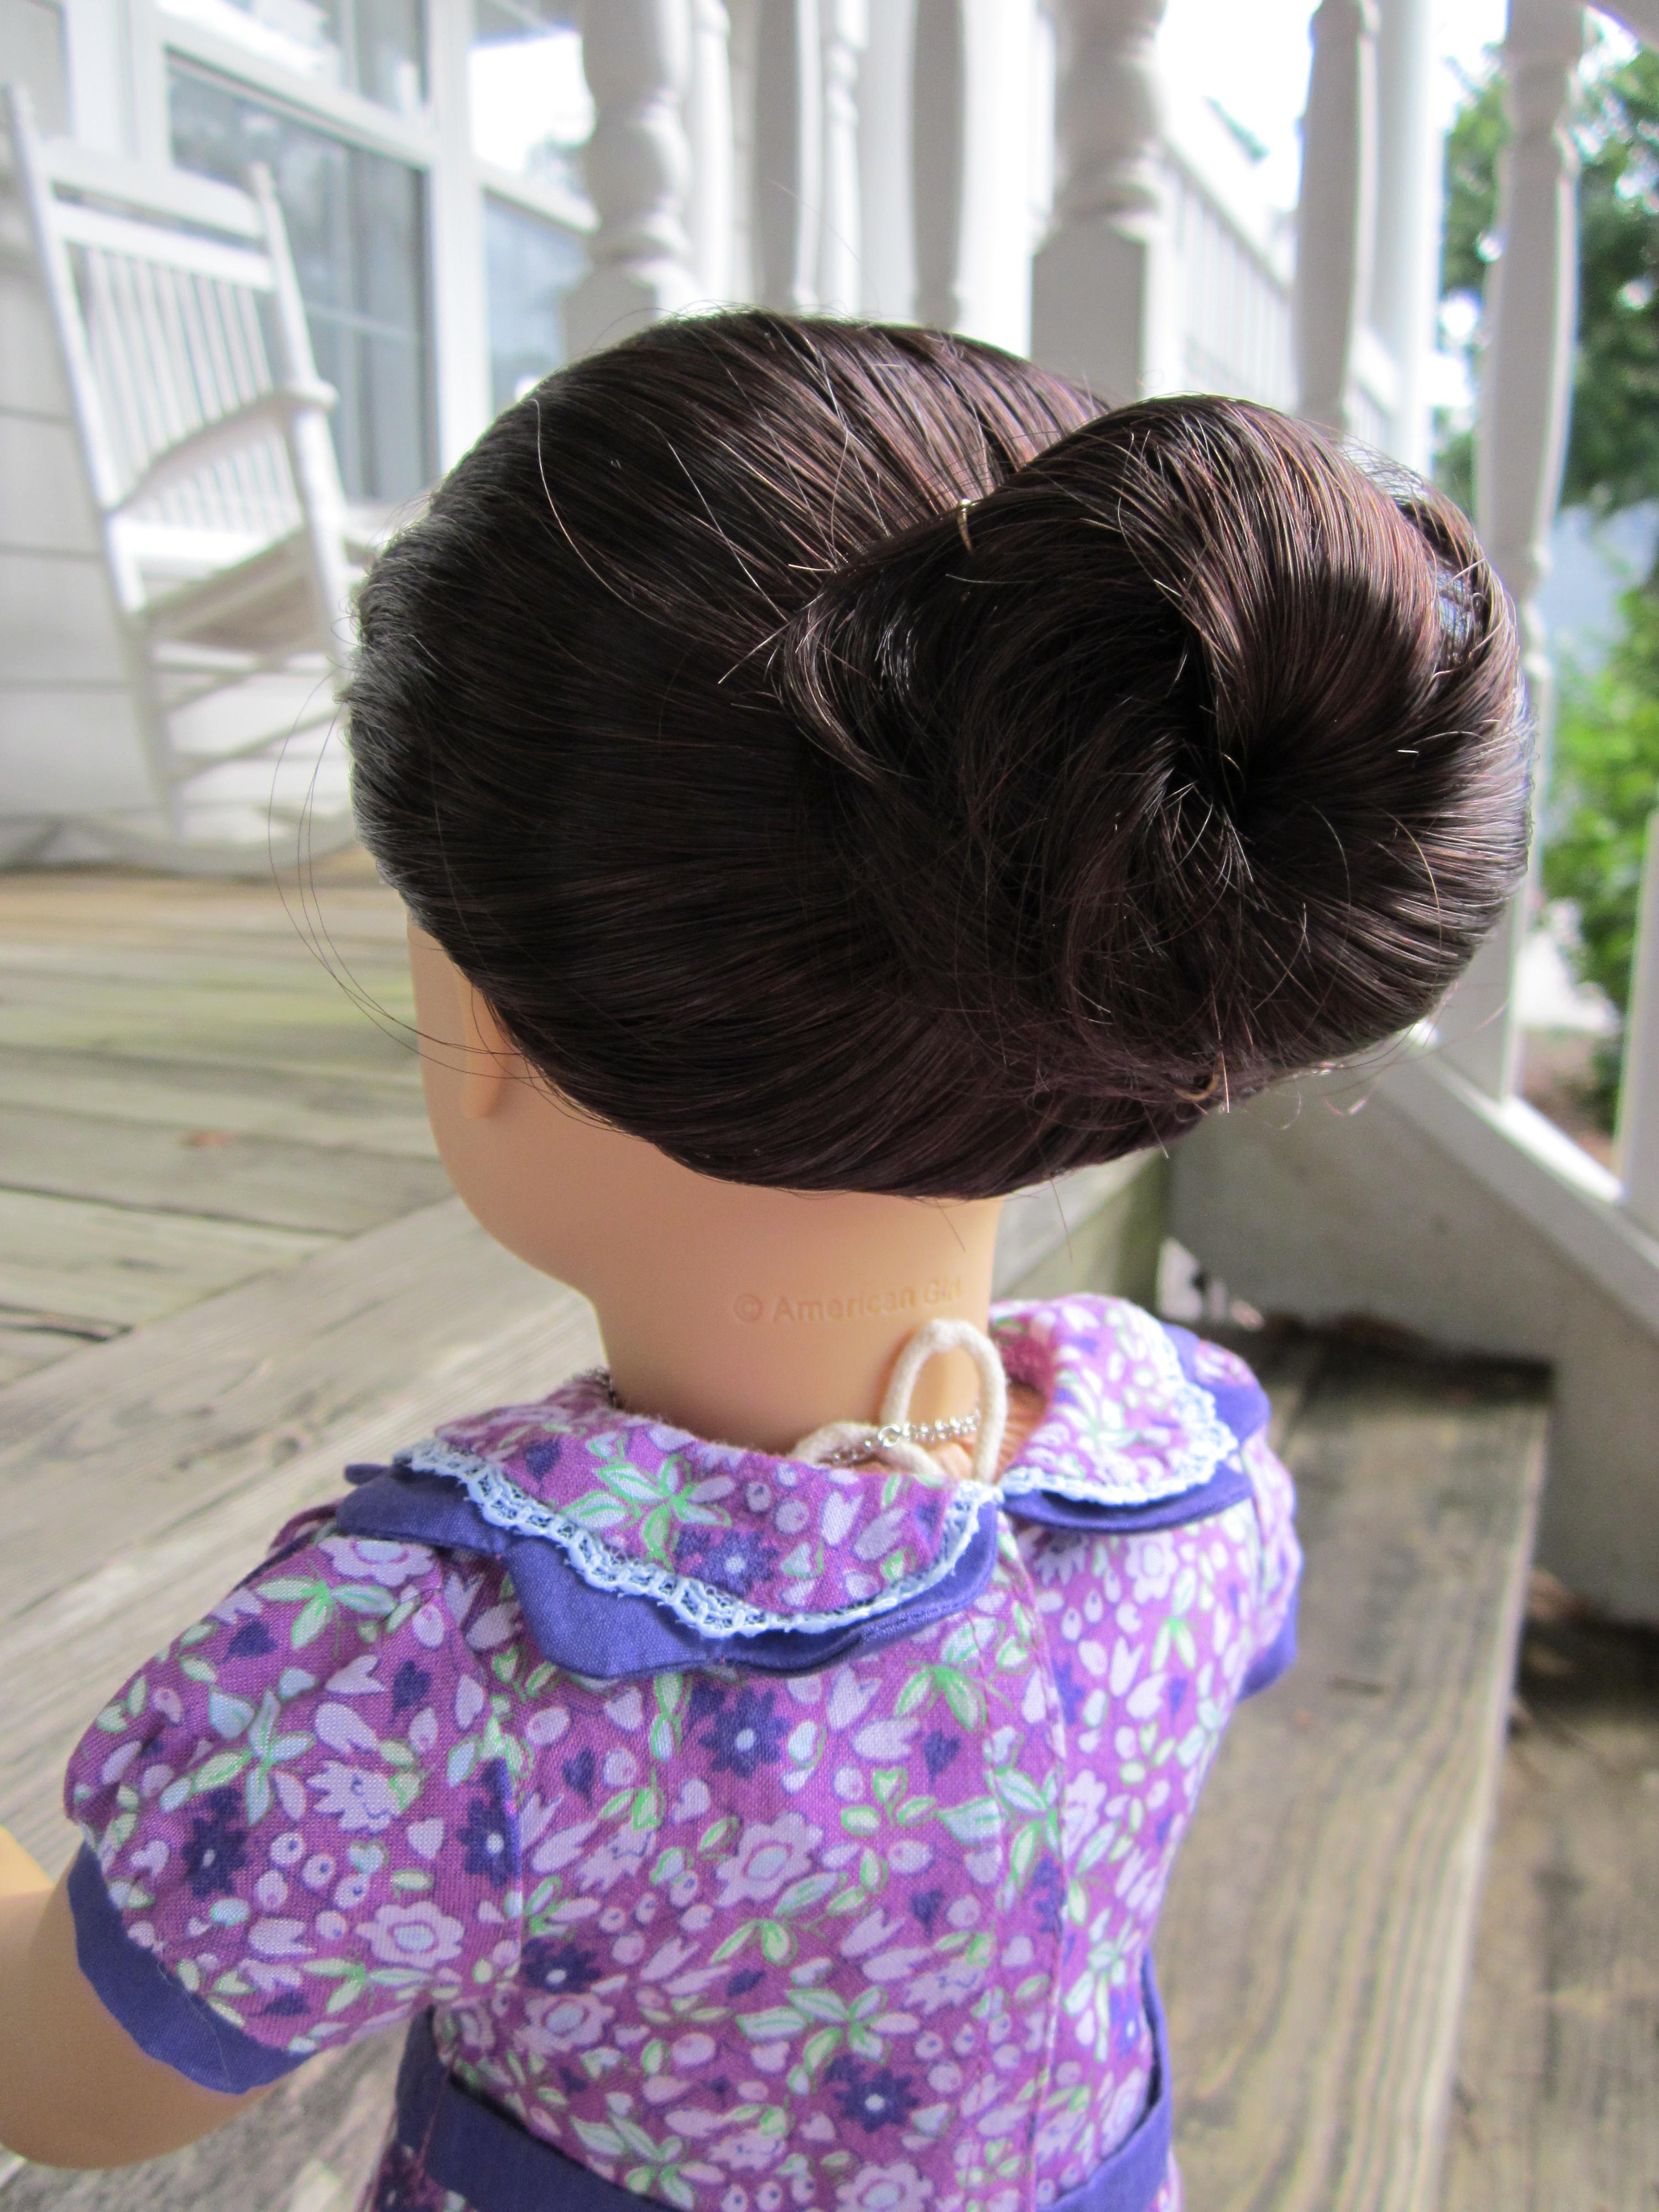 American Girl Hair Styles Theroommom